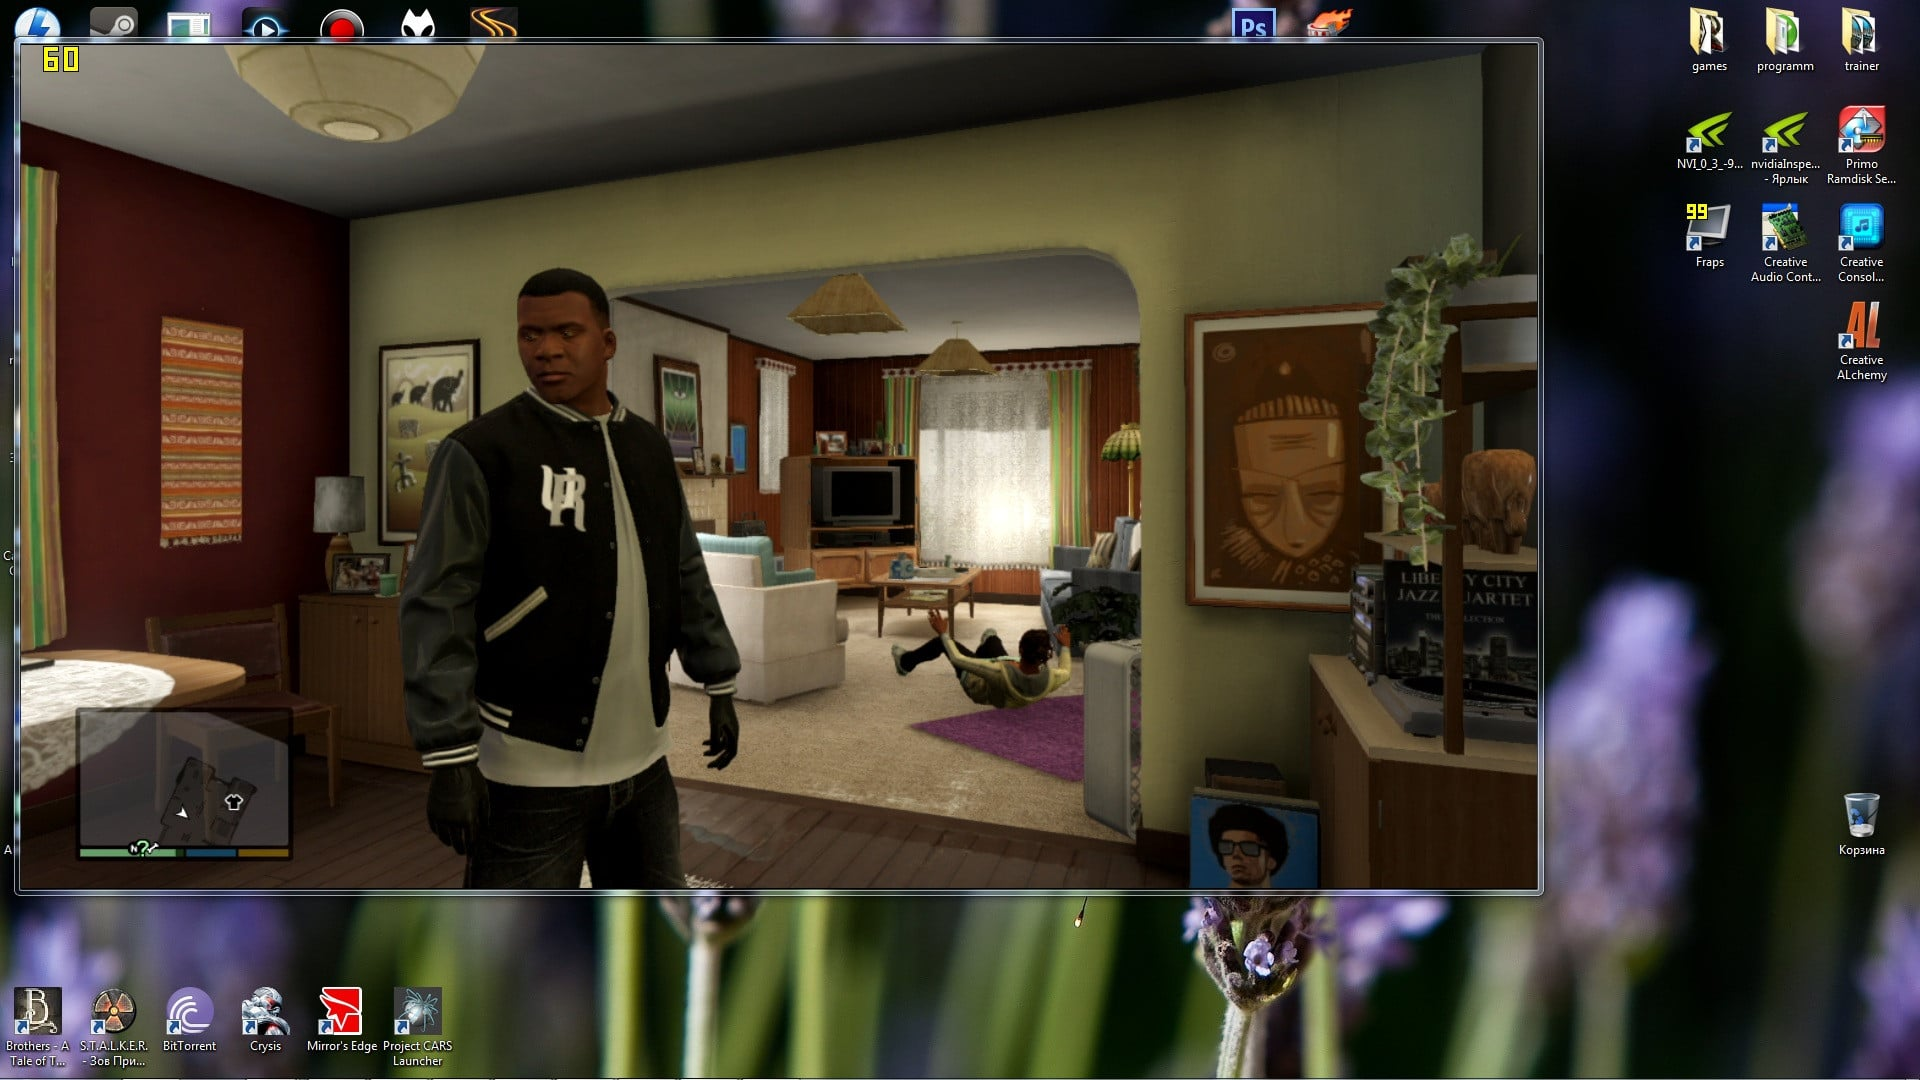 GTA V For PC Shows Up On Reddit – Fake Or Not? | eTeknix